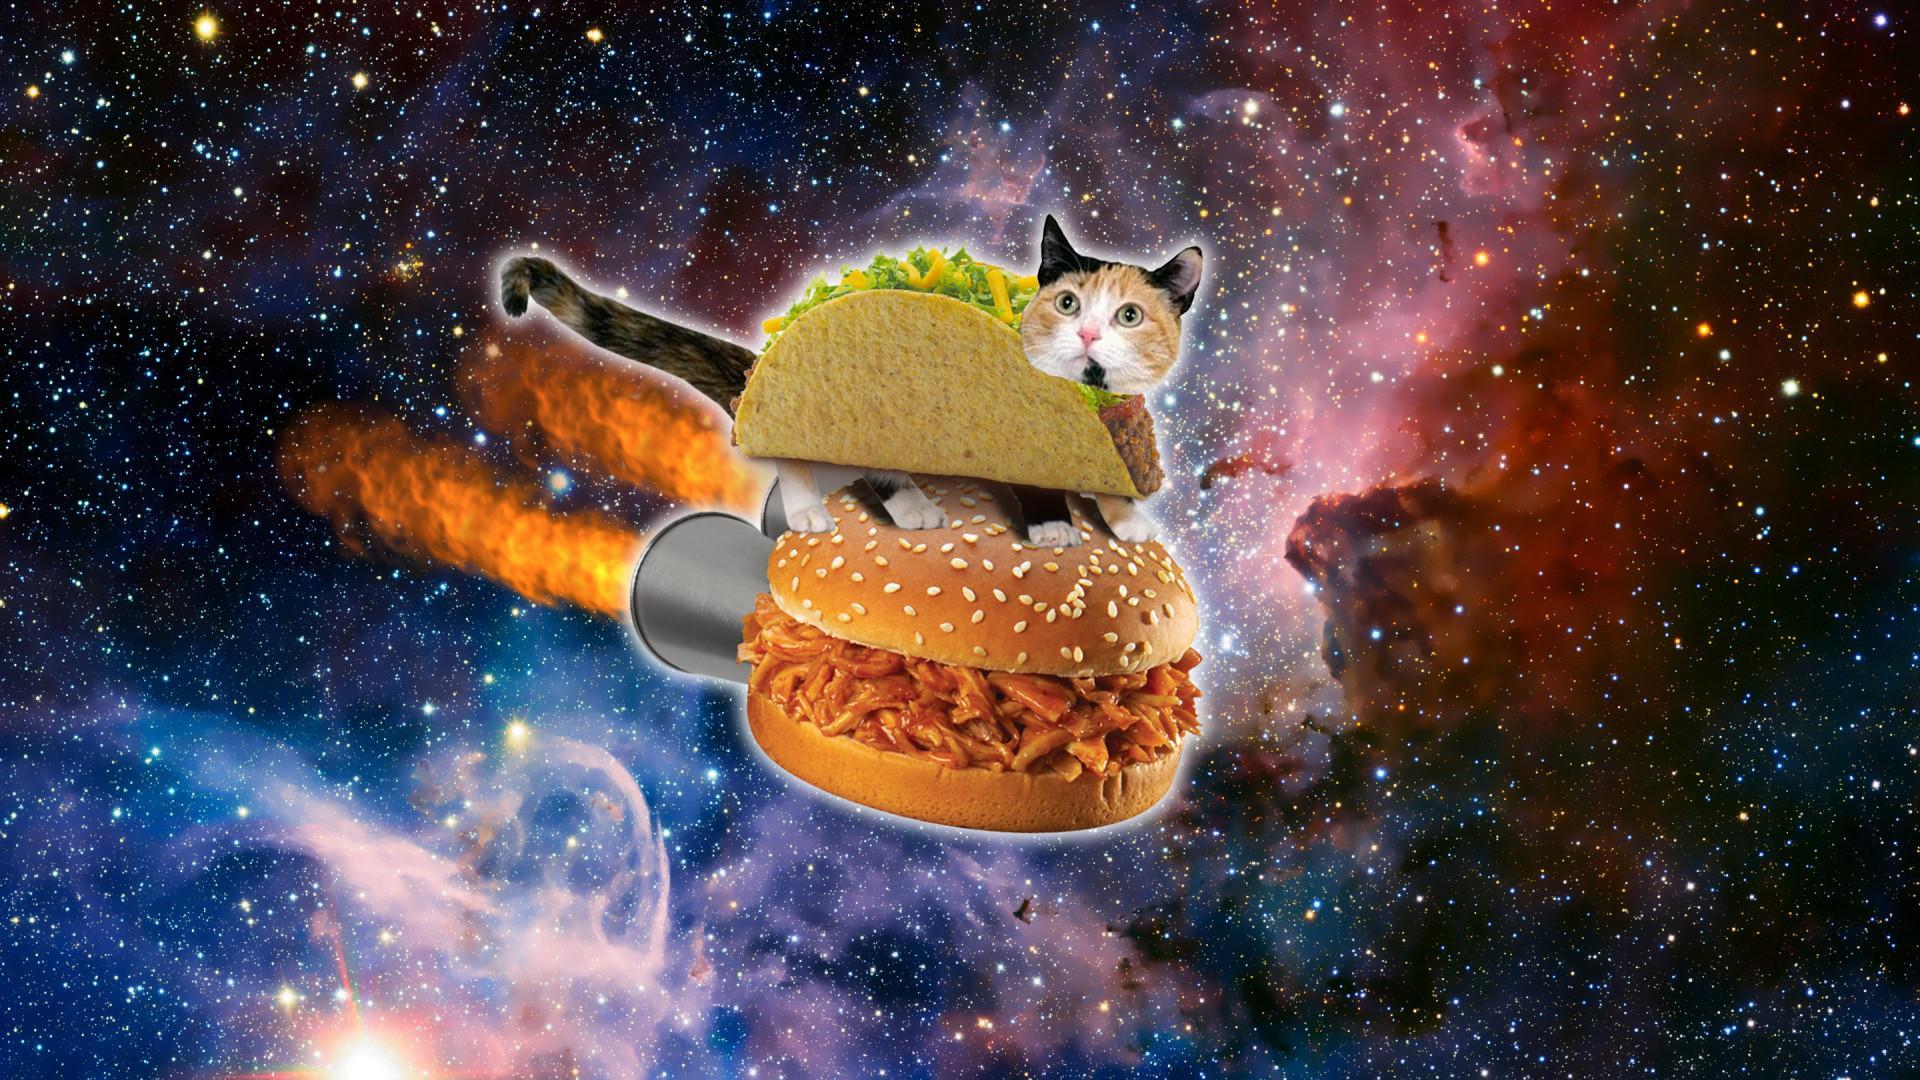 Space Kittens Desktop Wallpapers ...